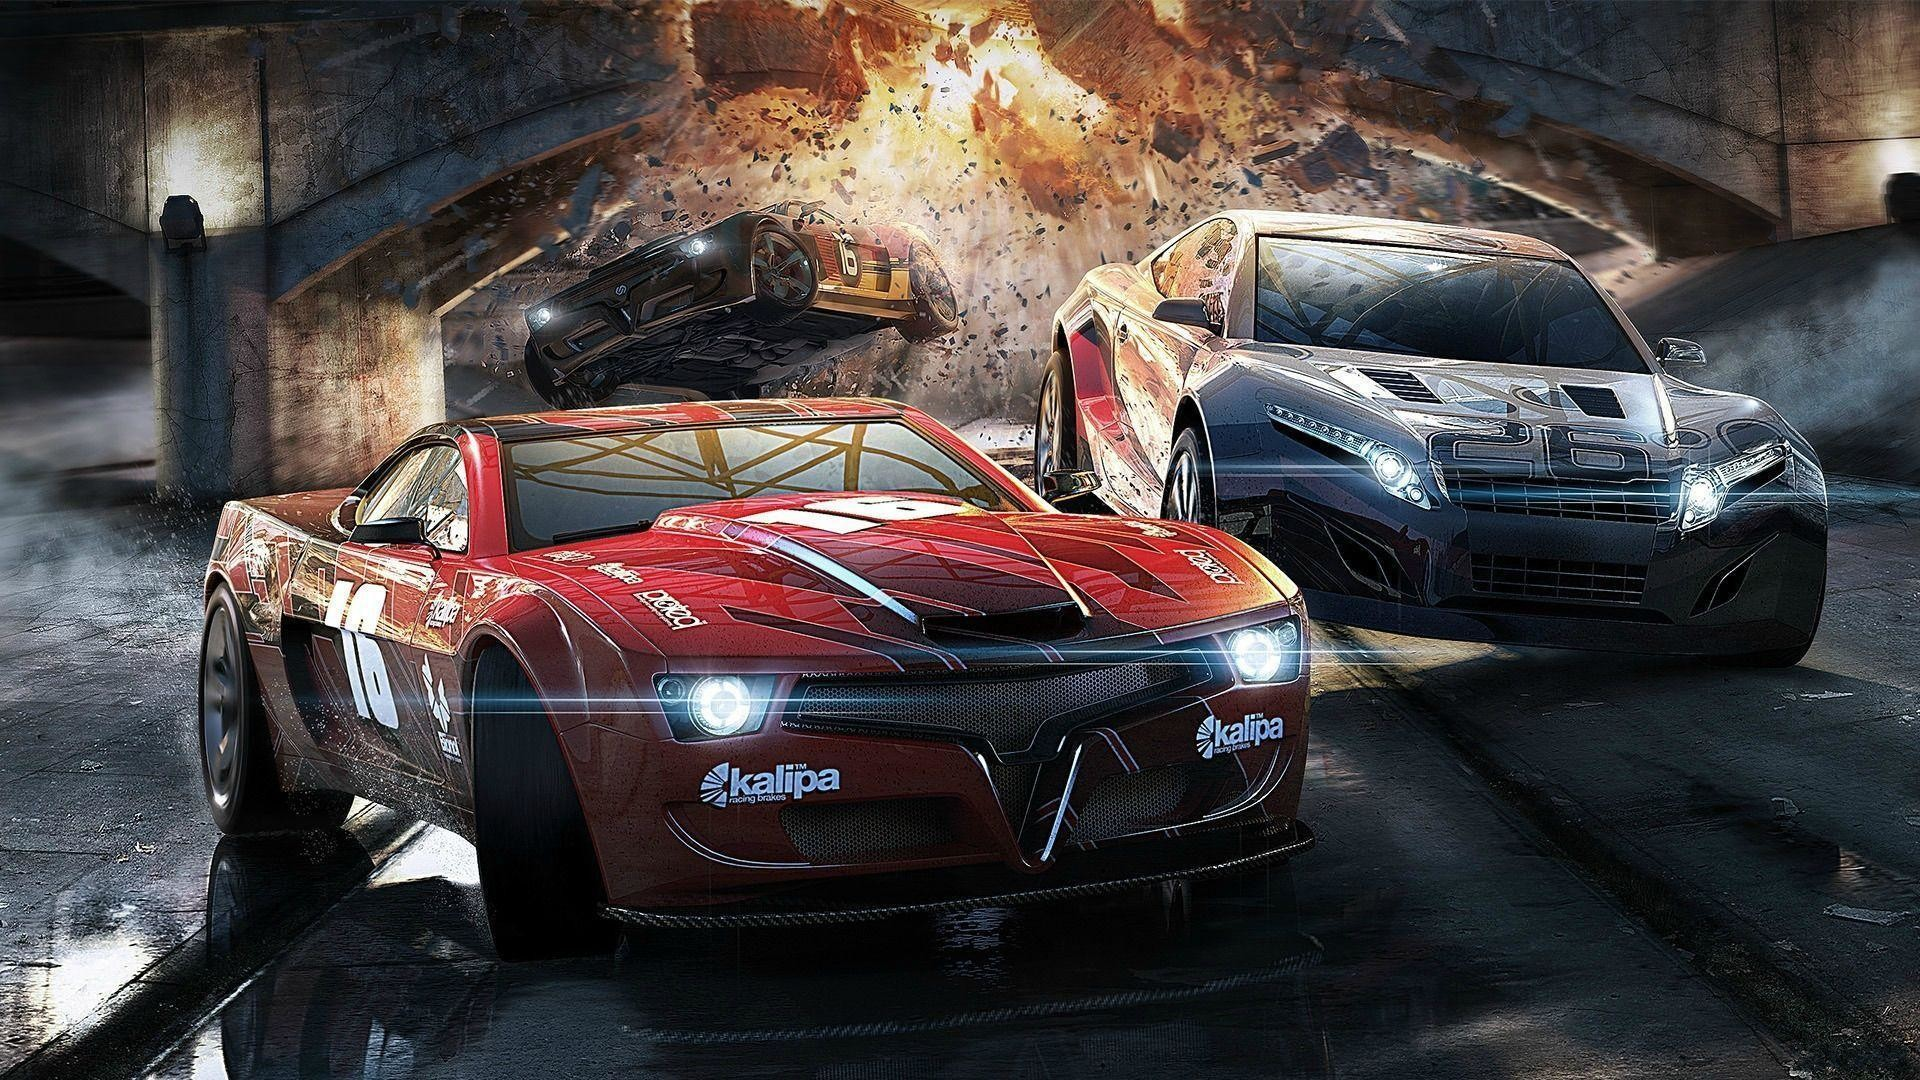 Street Racing Car Wallpaper 57 Images